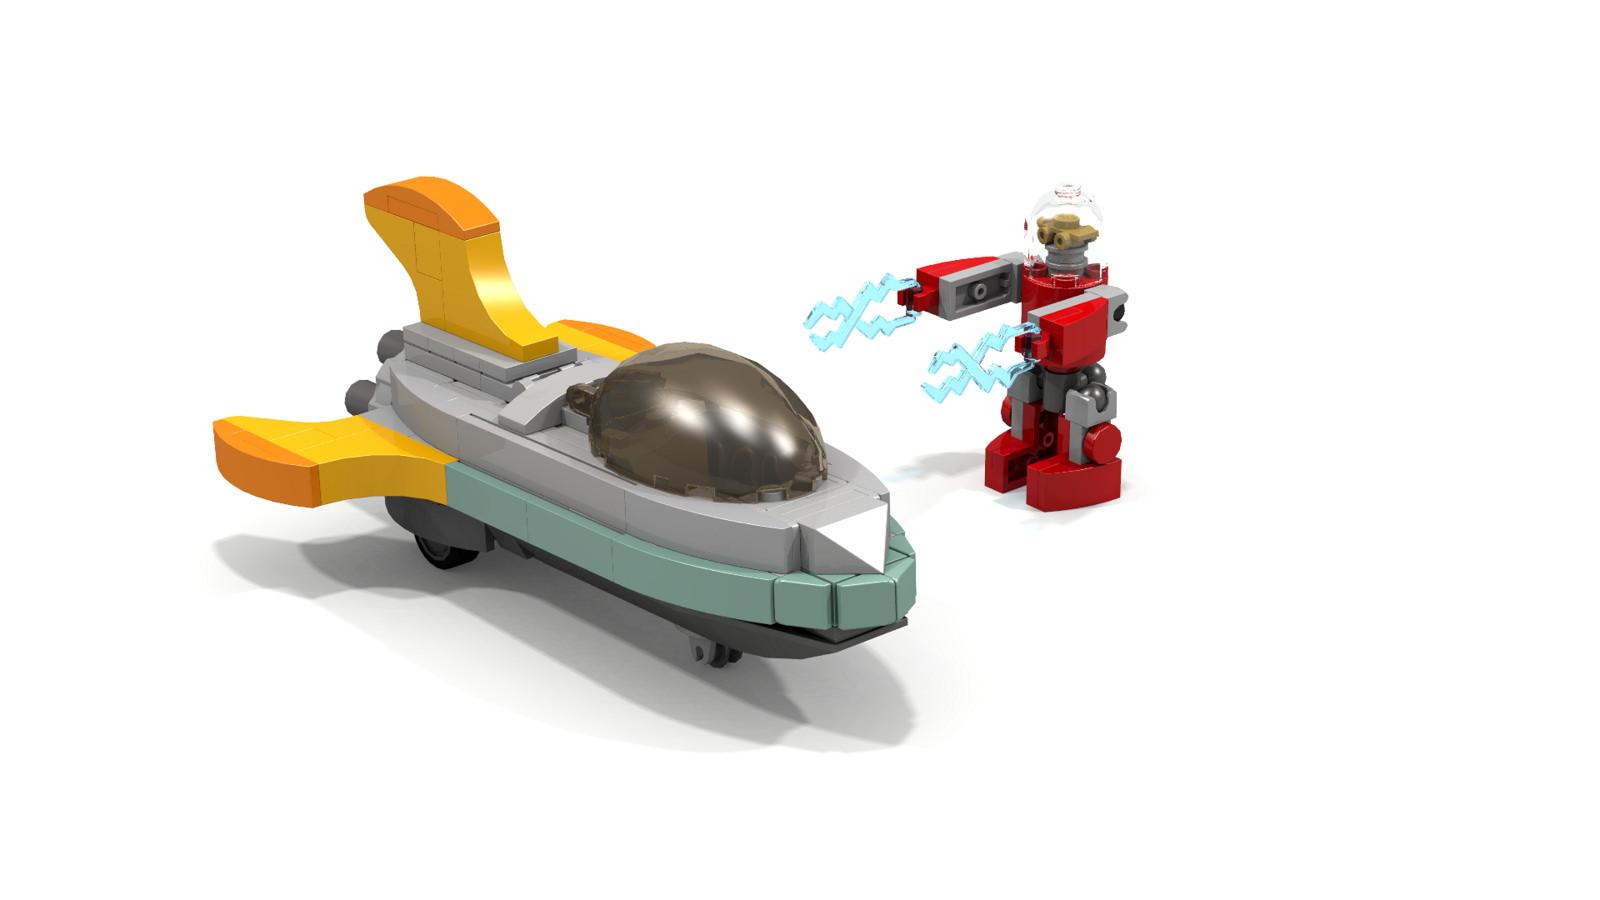 LEGO IDEAS - LEGO Moments in Space - Nick Nova's Spaceship